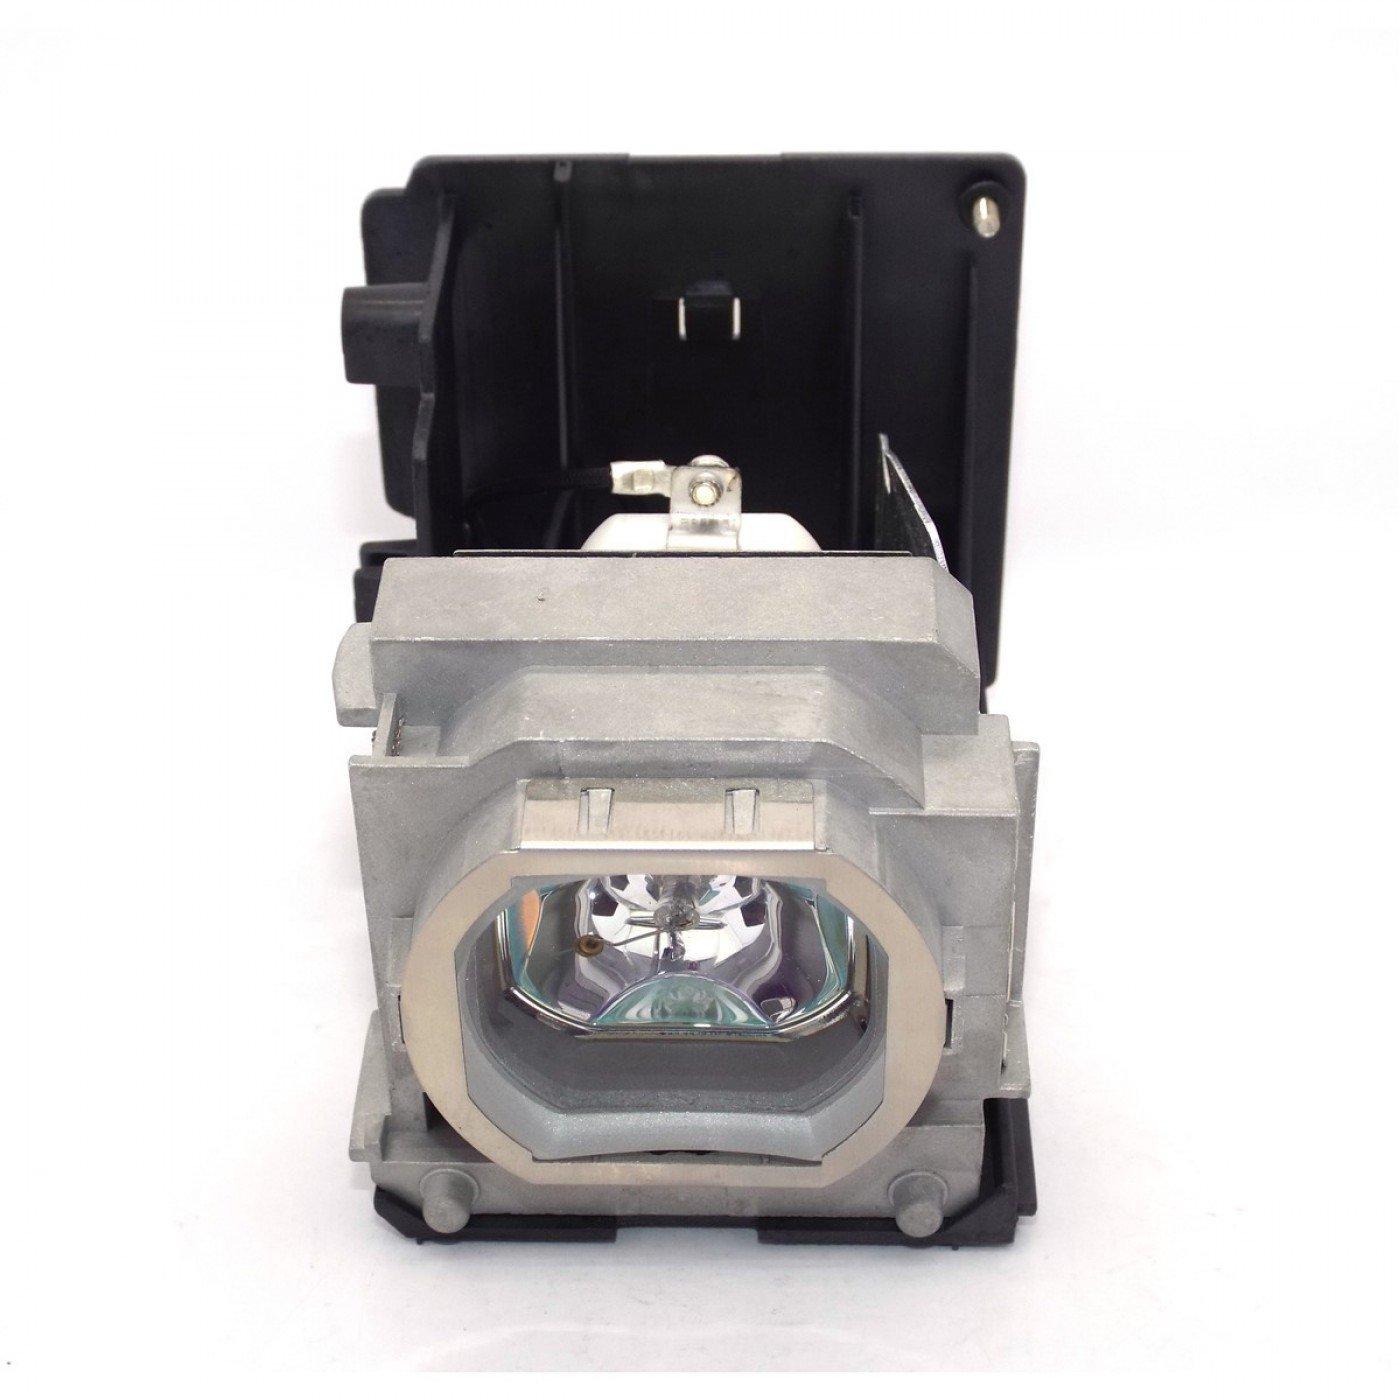 Rich Lighting プロジェクター 交換用 ランプ VLT-HC6800LP 三菱電機 MITSUBISHI プロジェクター LVP-HC6800 対応 【180日保証】 B0774DJ8JG